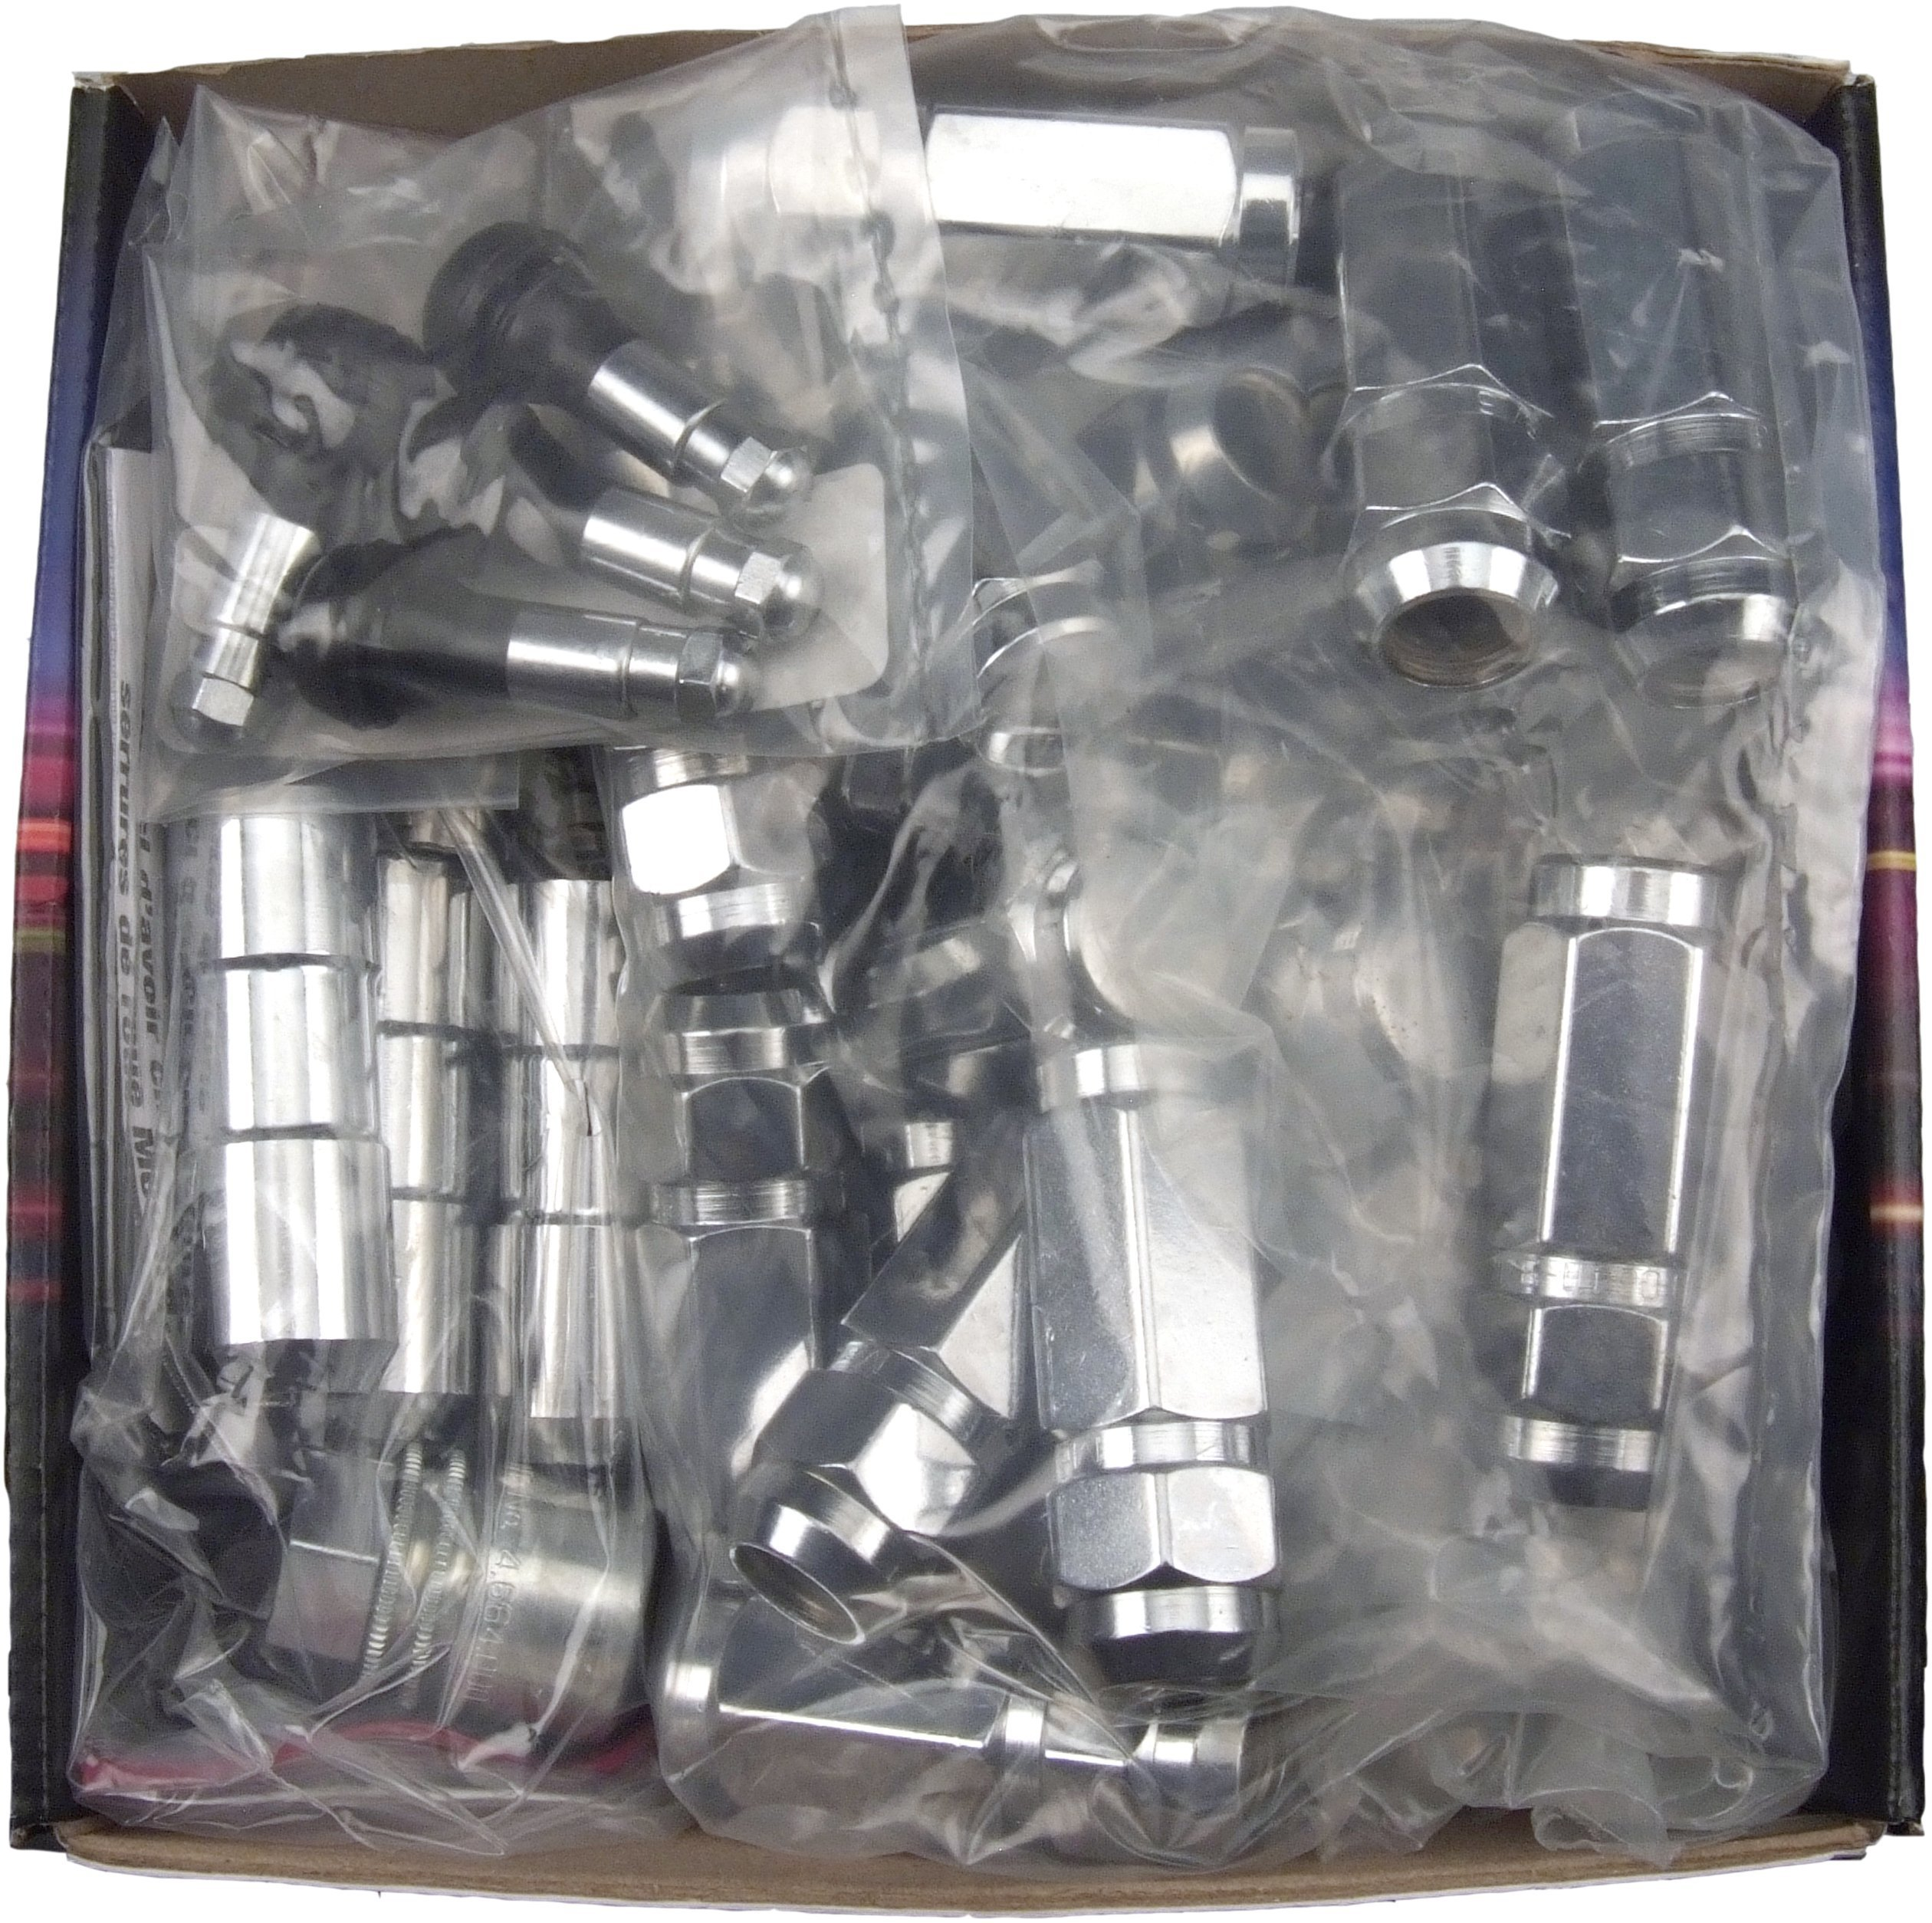 McGard 84834 Chrome Cone Seat Wheel Installation Kit (9/16 - 18 Thread Size) - For 8 Lug Wheels